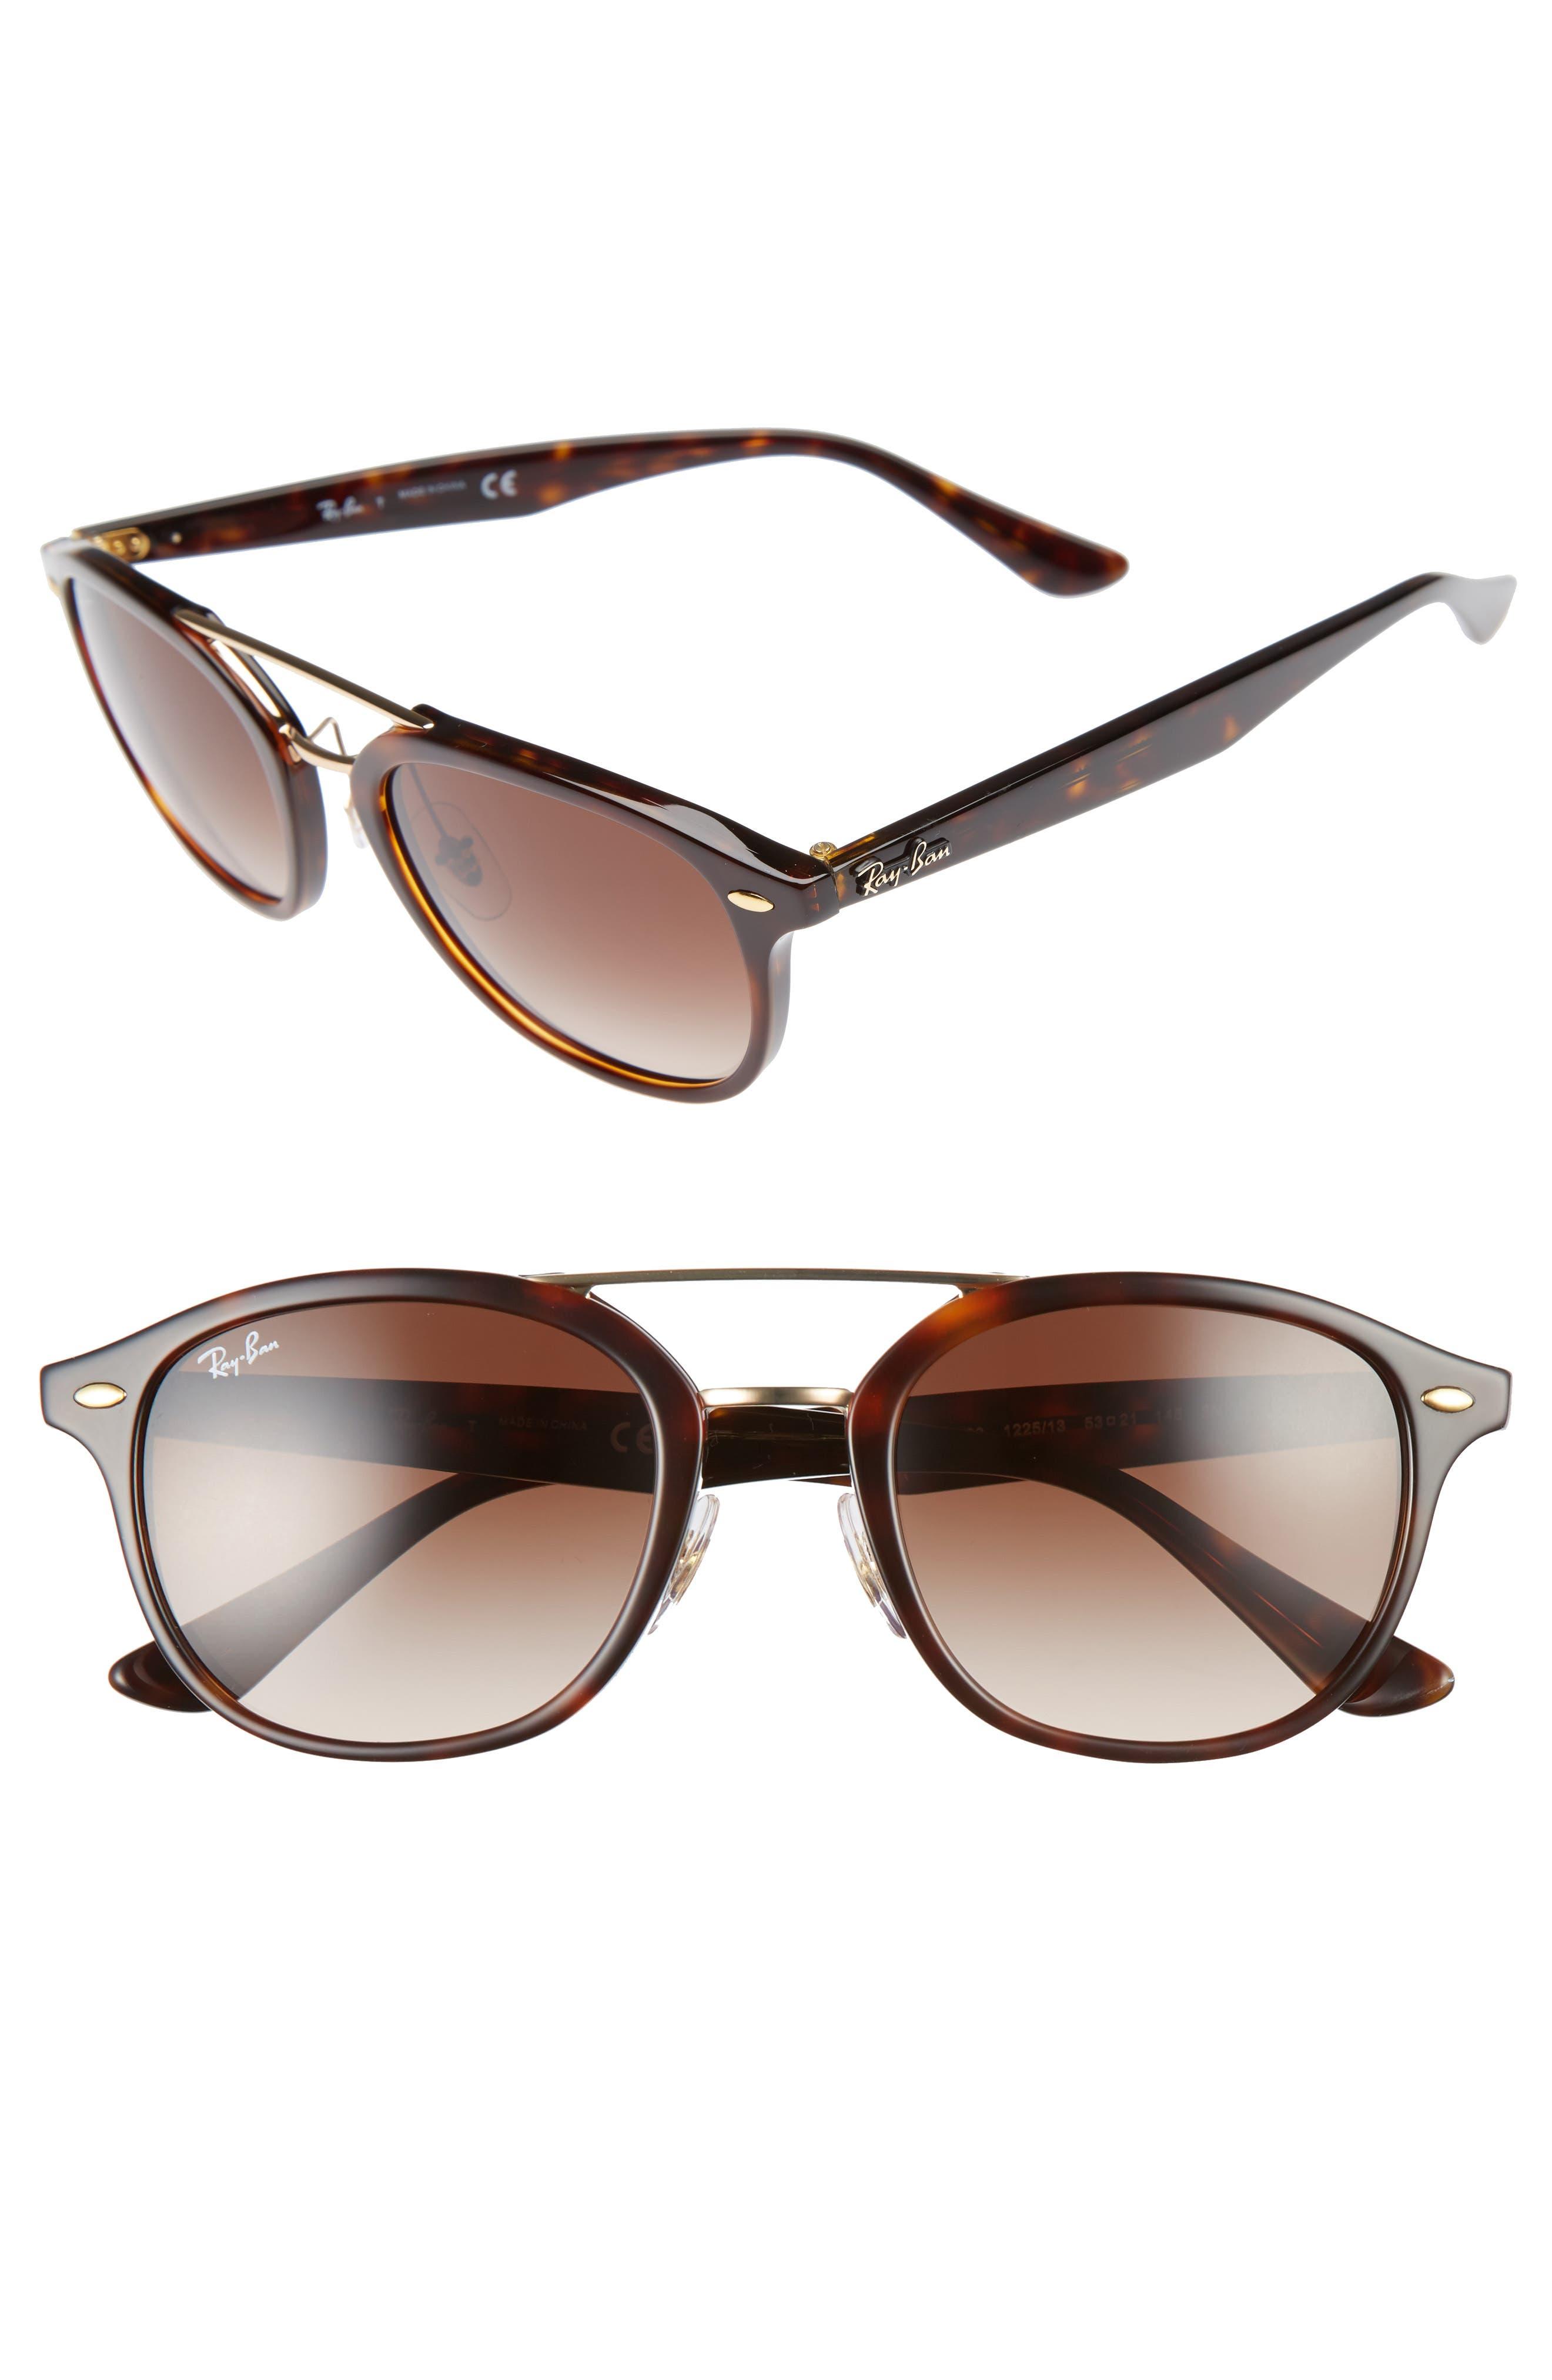 Highstreet 53mm Gradient Lens Sunglasses,                             Main thumbnail 1, color,                             BROWN HAVANA